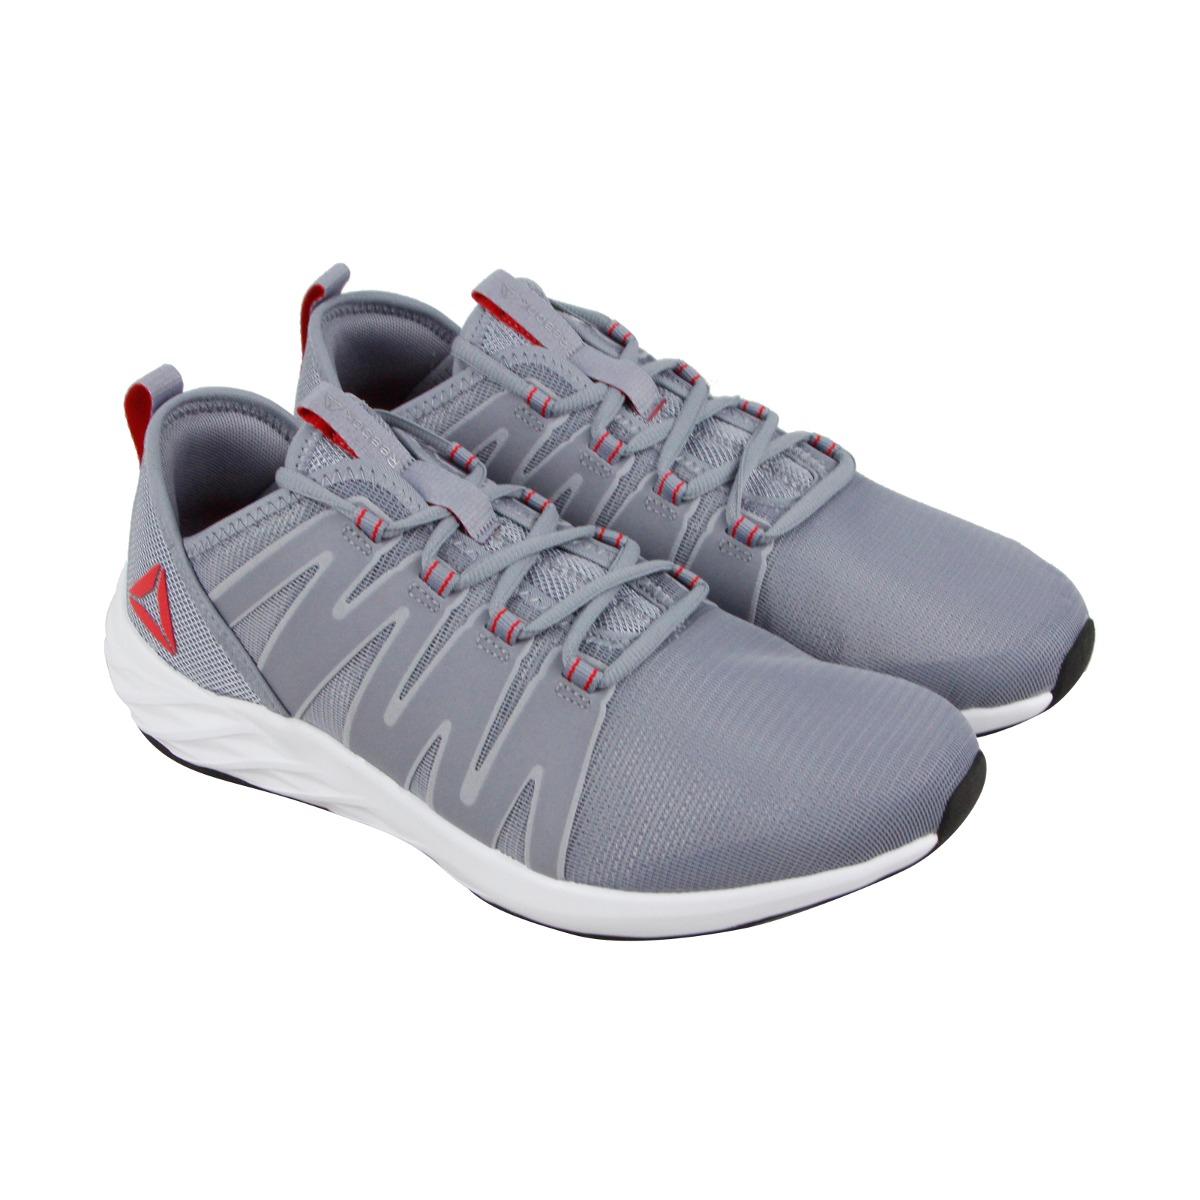 f2a01344a3df Zapatos Astroride Futuro Deporte Ex Reebok -   1.704